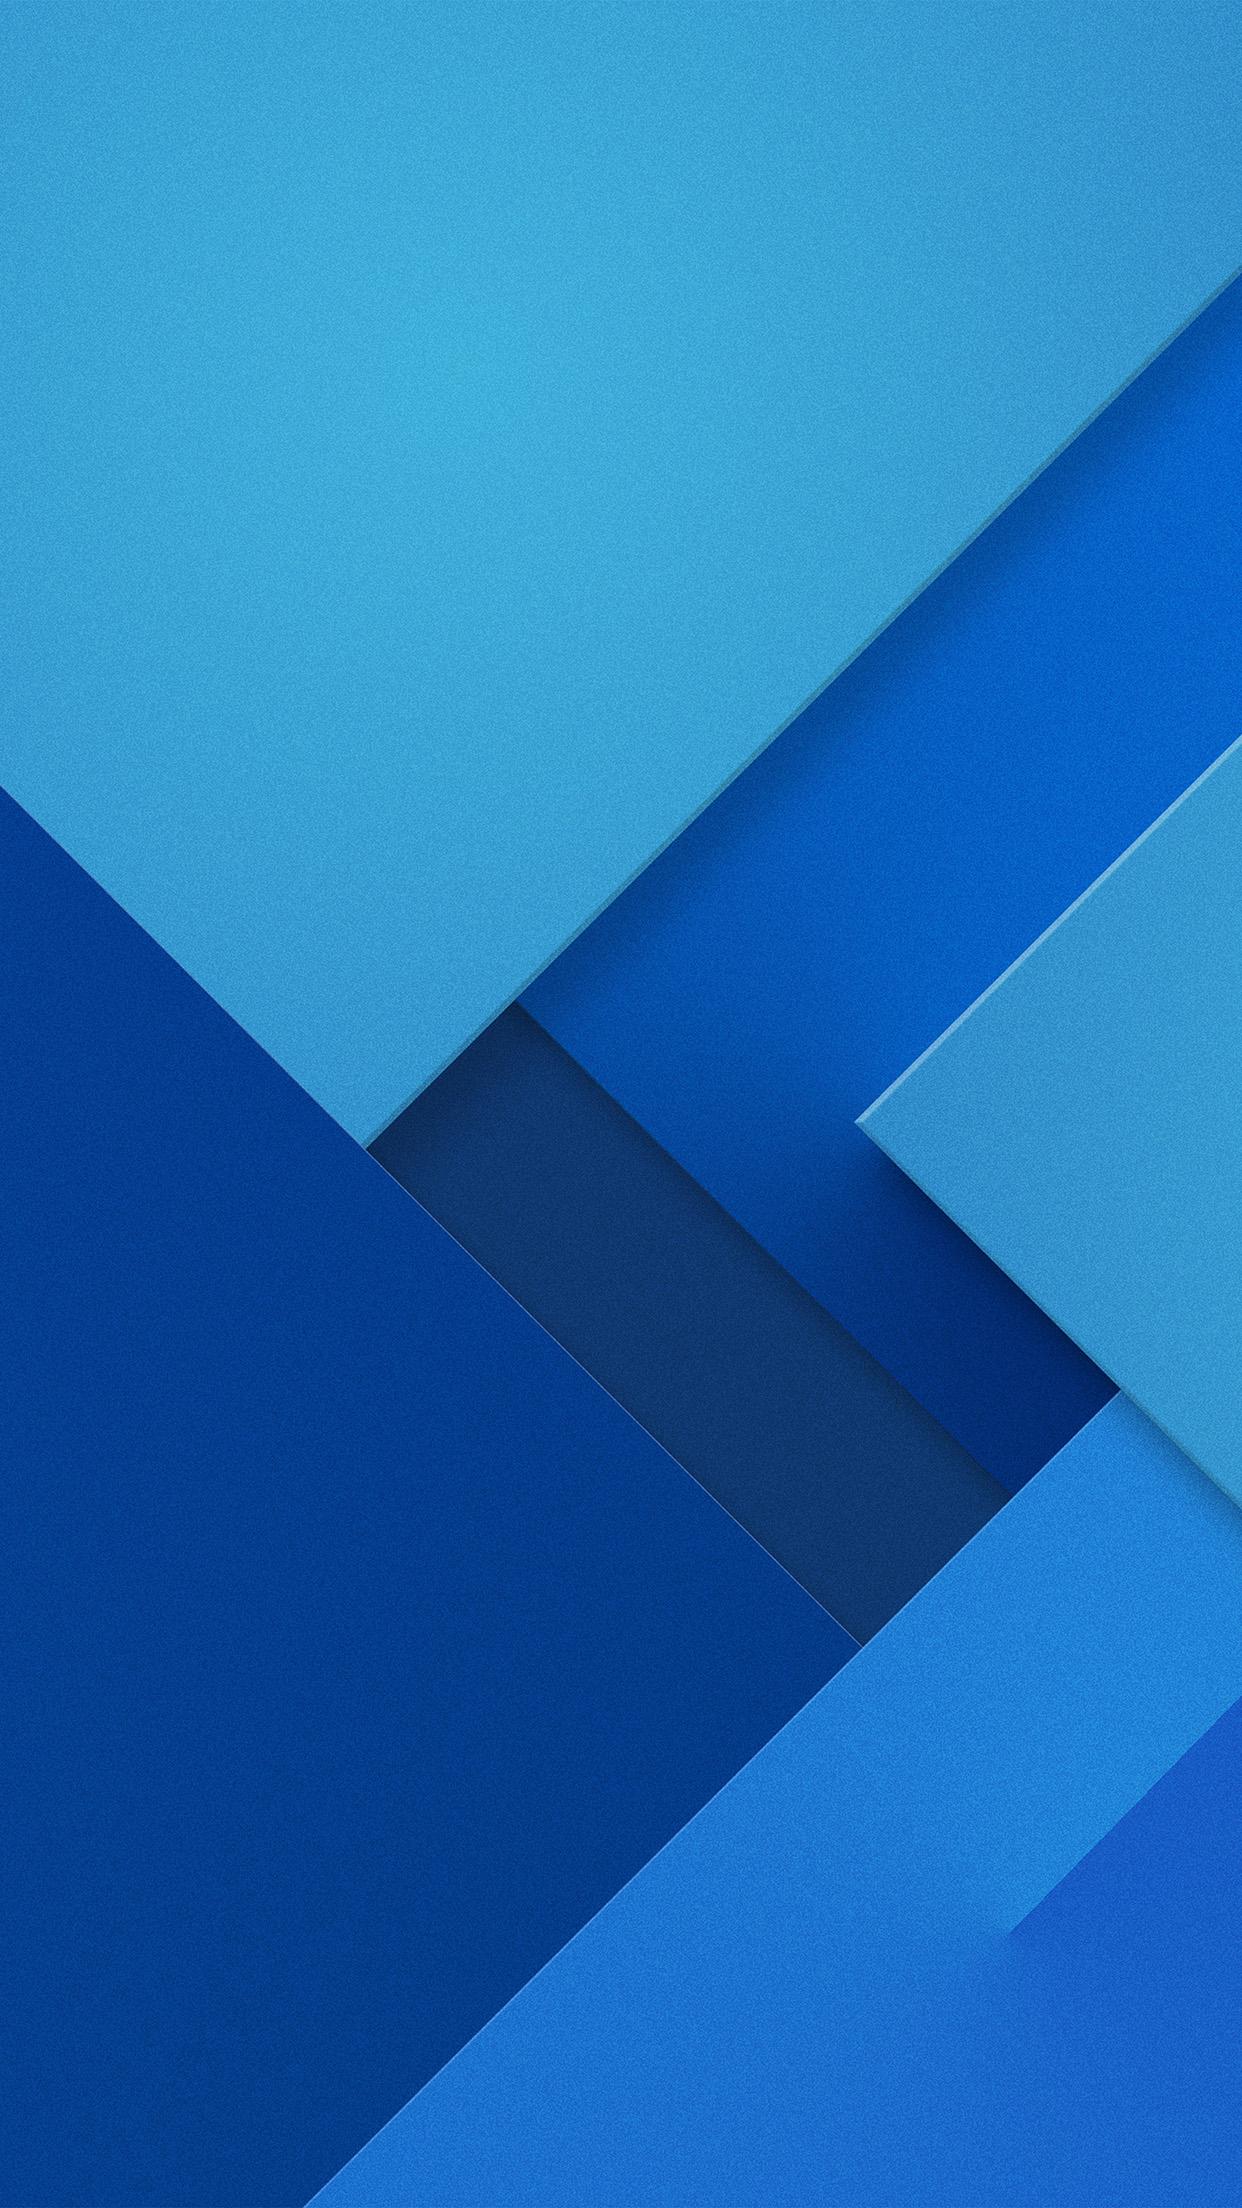 Samsung Galaxy S7 Edge Fall Wallpaper Iphone X